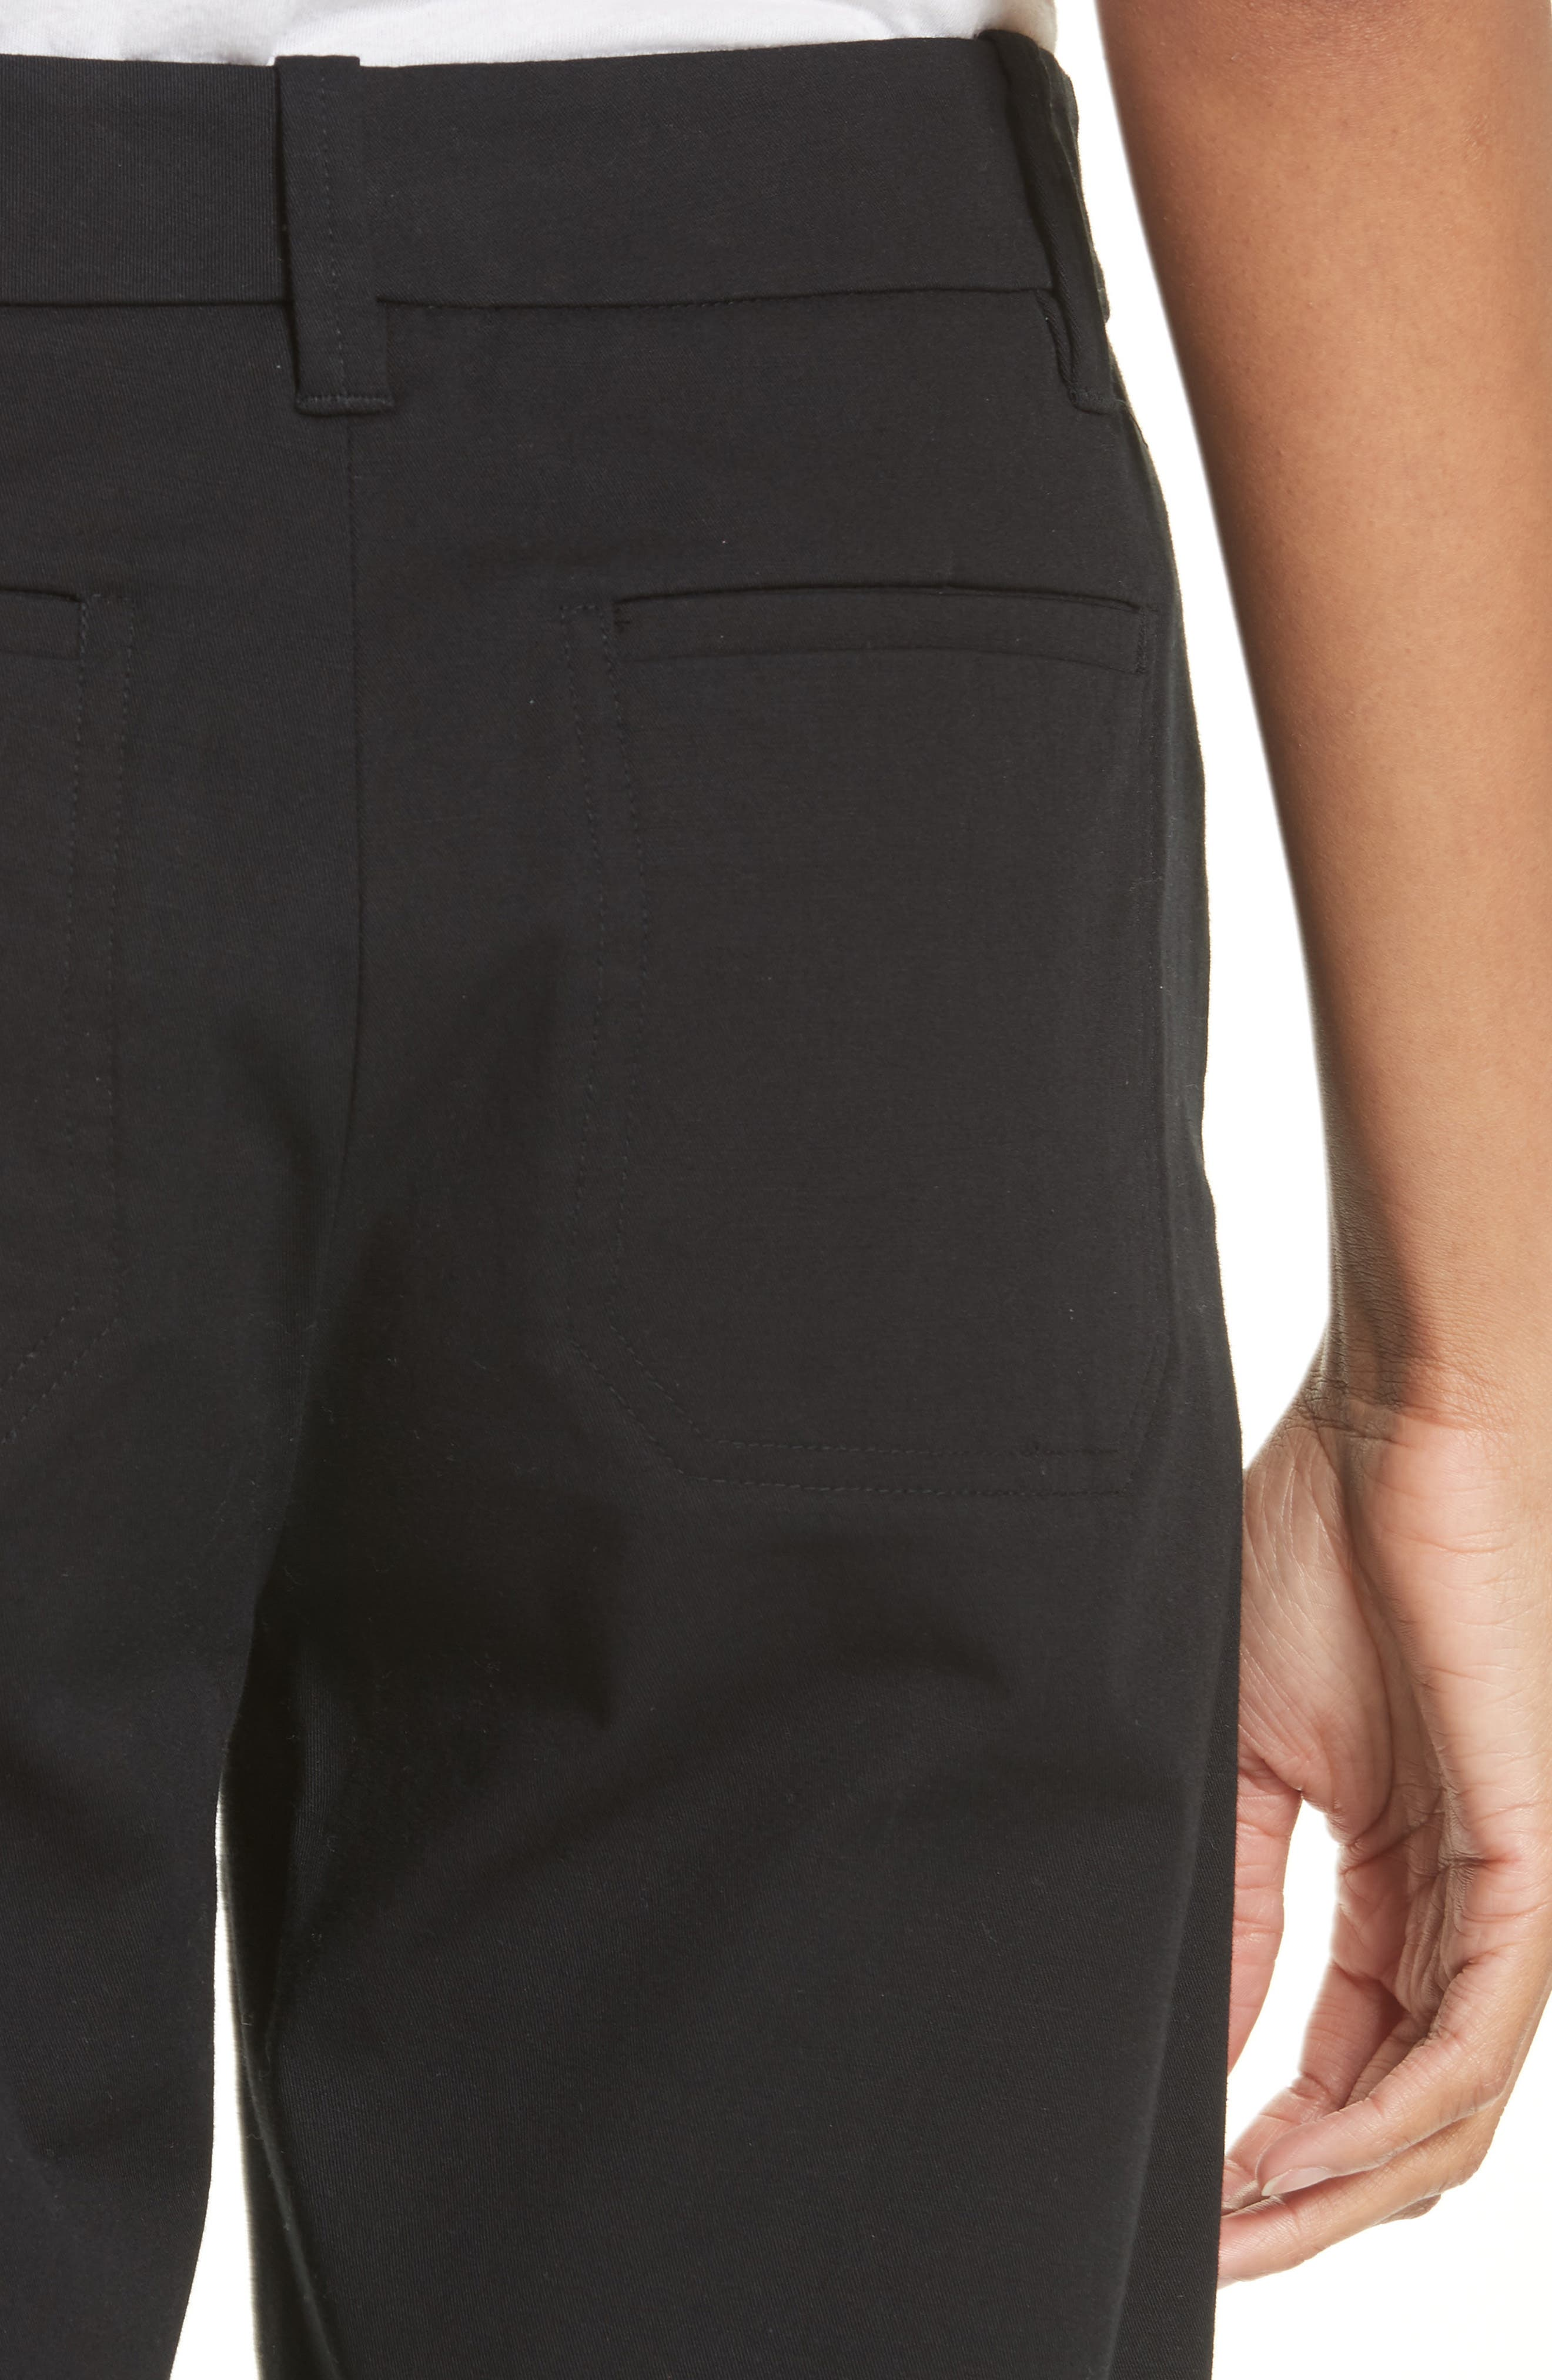 Bermuda Shorts,                             Alternate thumbnail 5, color,                             Black